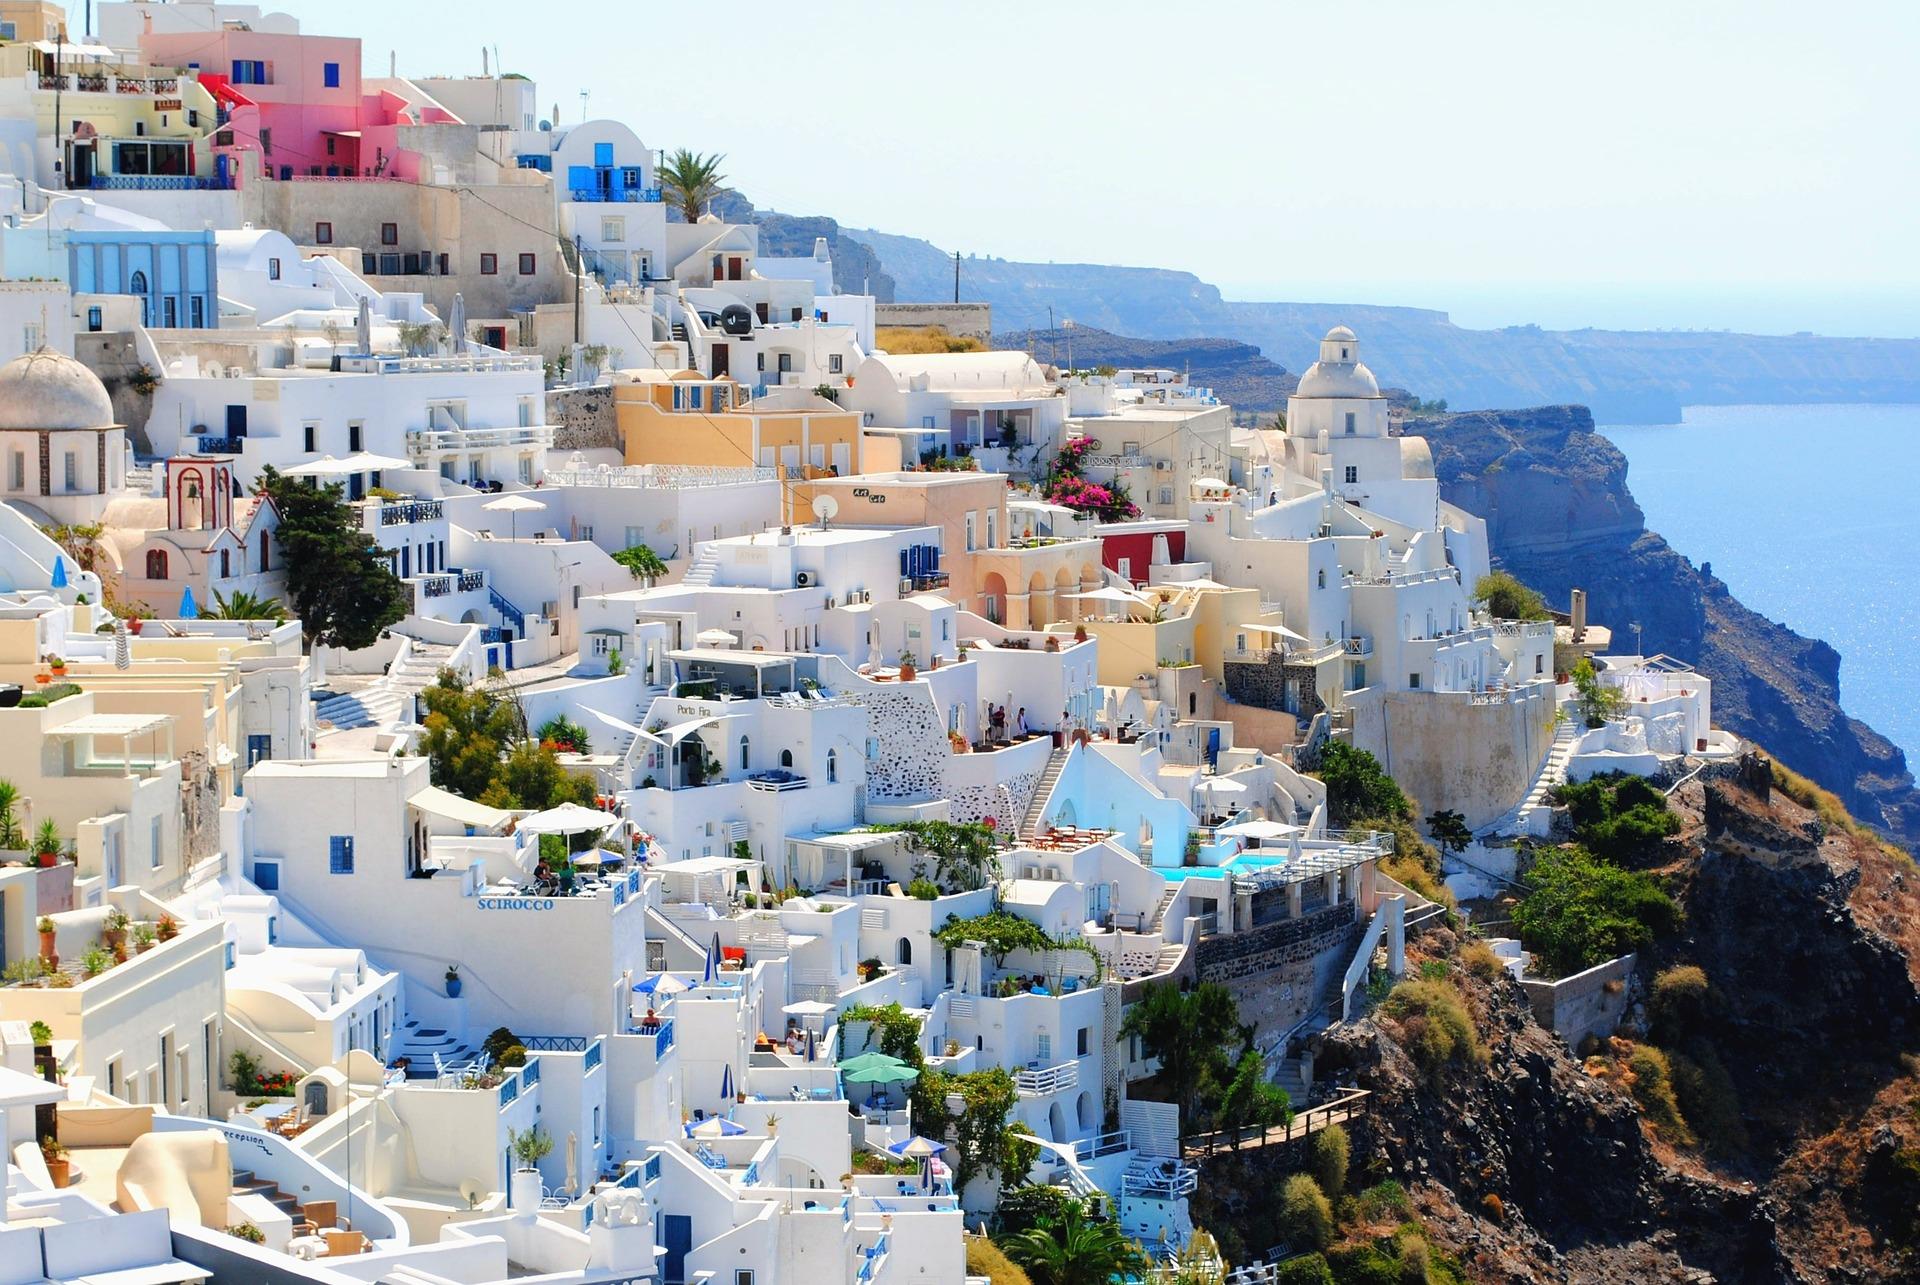 Санторини, Греция, путешествия, праздник, Лето, деревня, Море, Небо, Бегство экран HD обои - Профессор falken.com